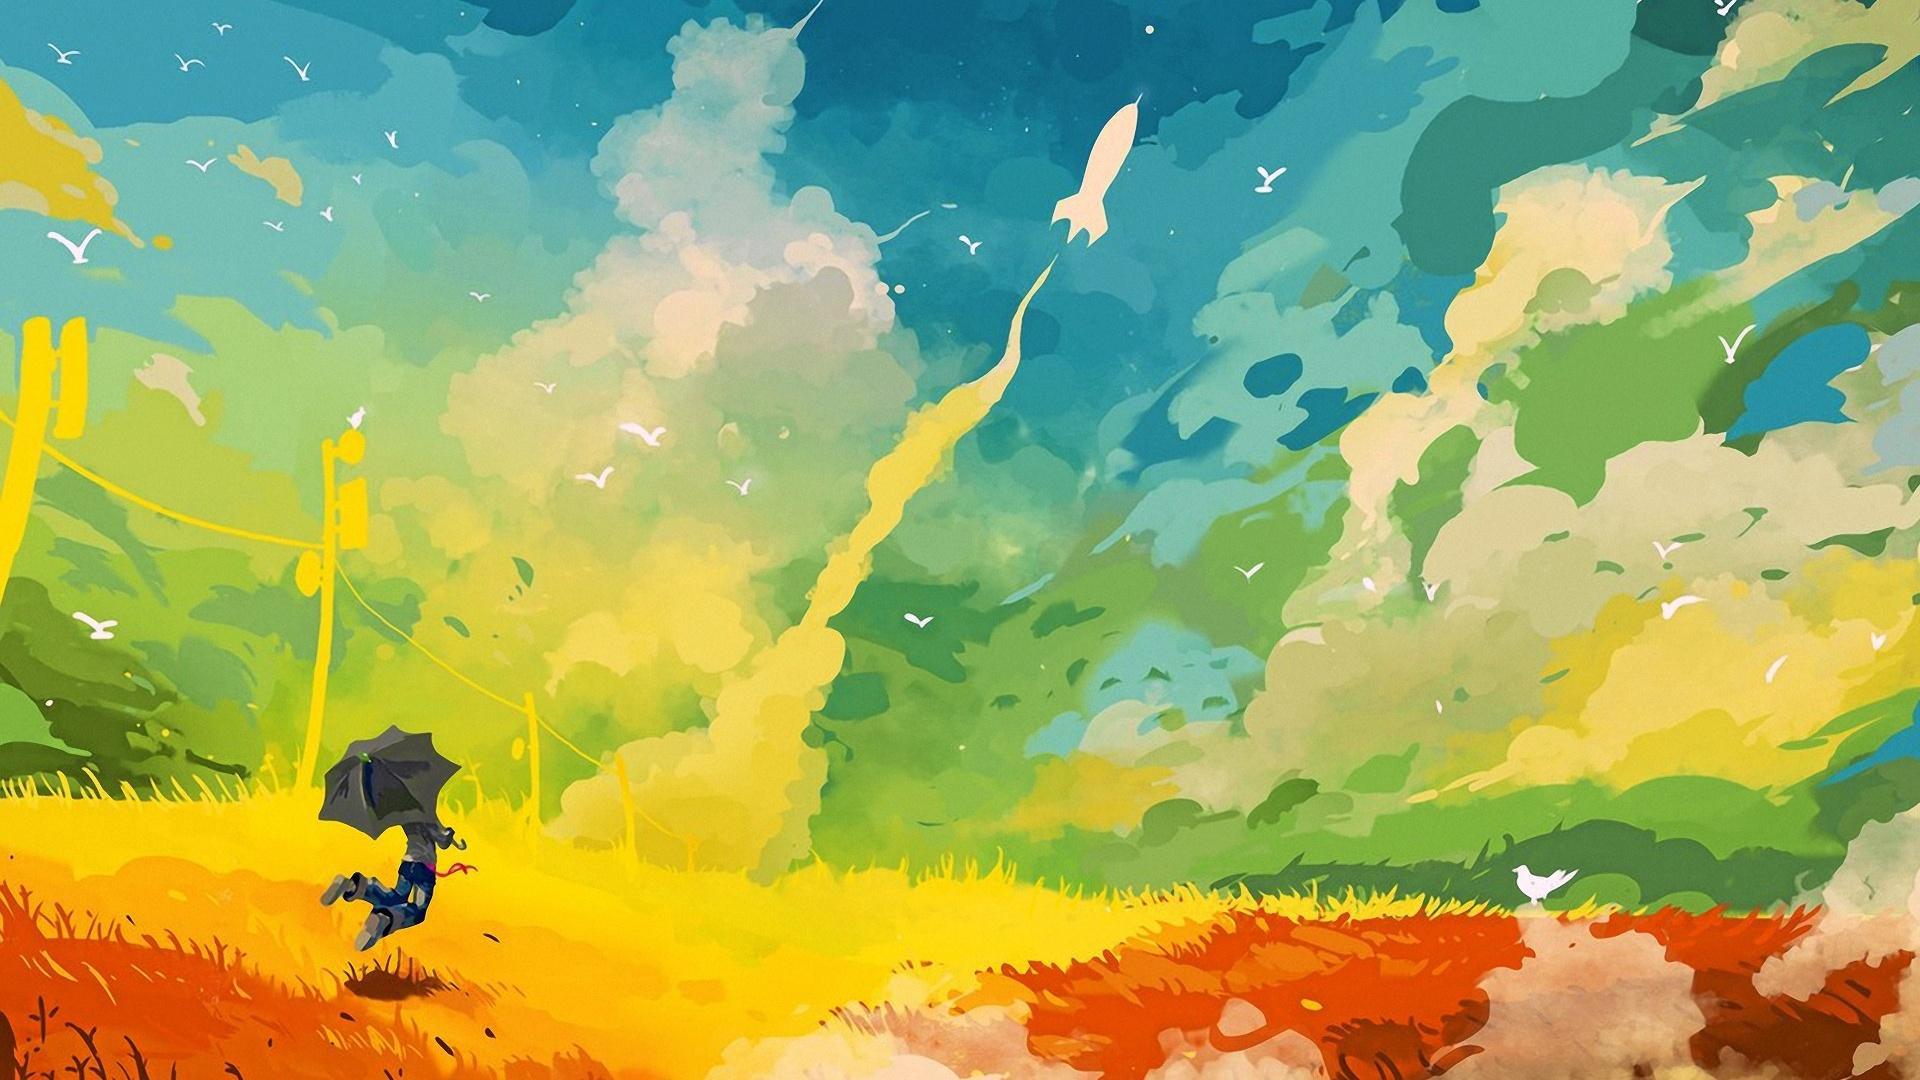 Free Download Art Desktop Backgrounds WallpaperAsk [1920x1080] For Your  Desktop, Mobile & Tablet | Explore 44+ Art Backgrounds | Wallpaper Art, Art  Wallpaper, Art Wallpapers